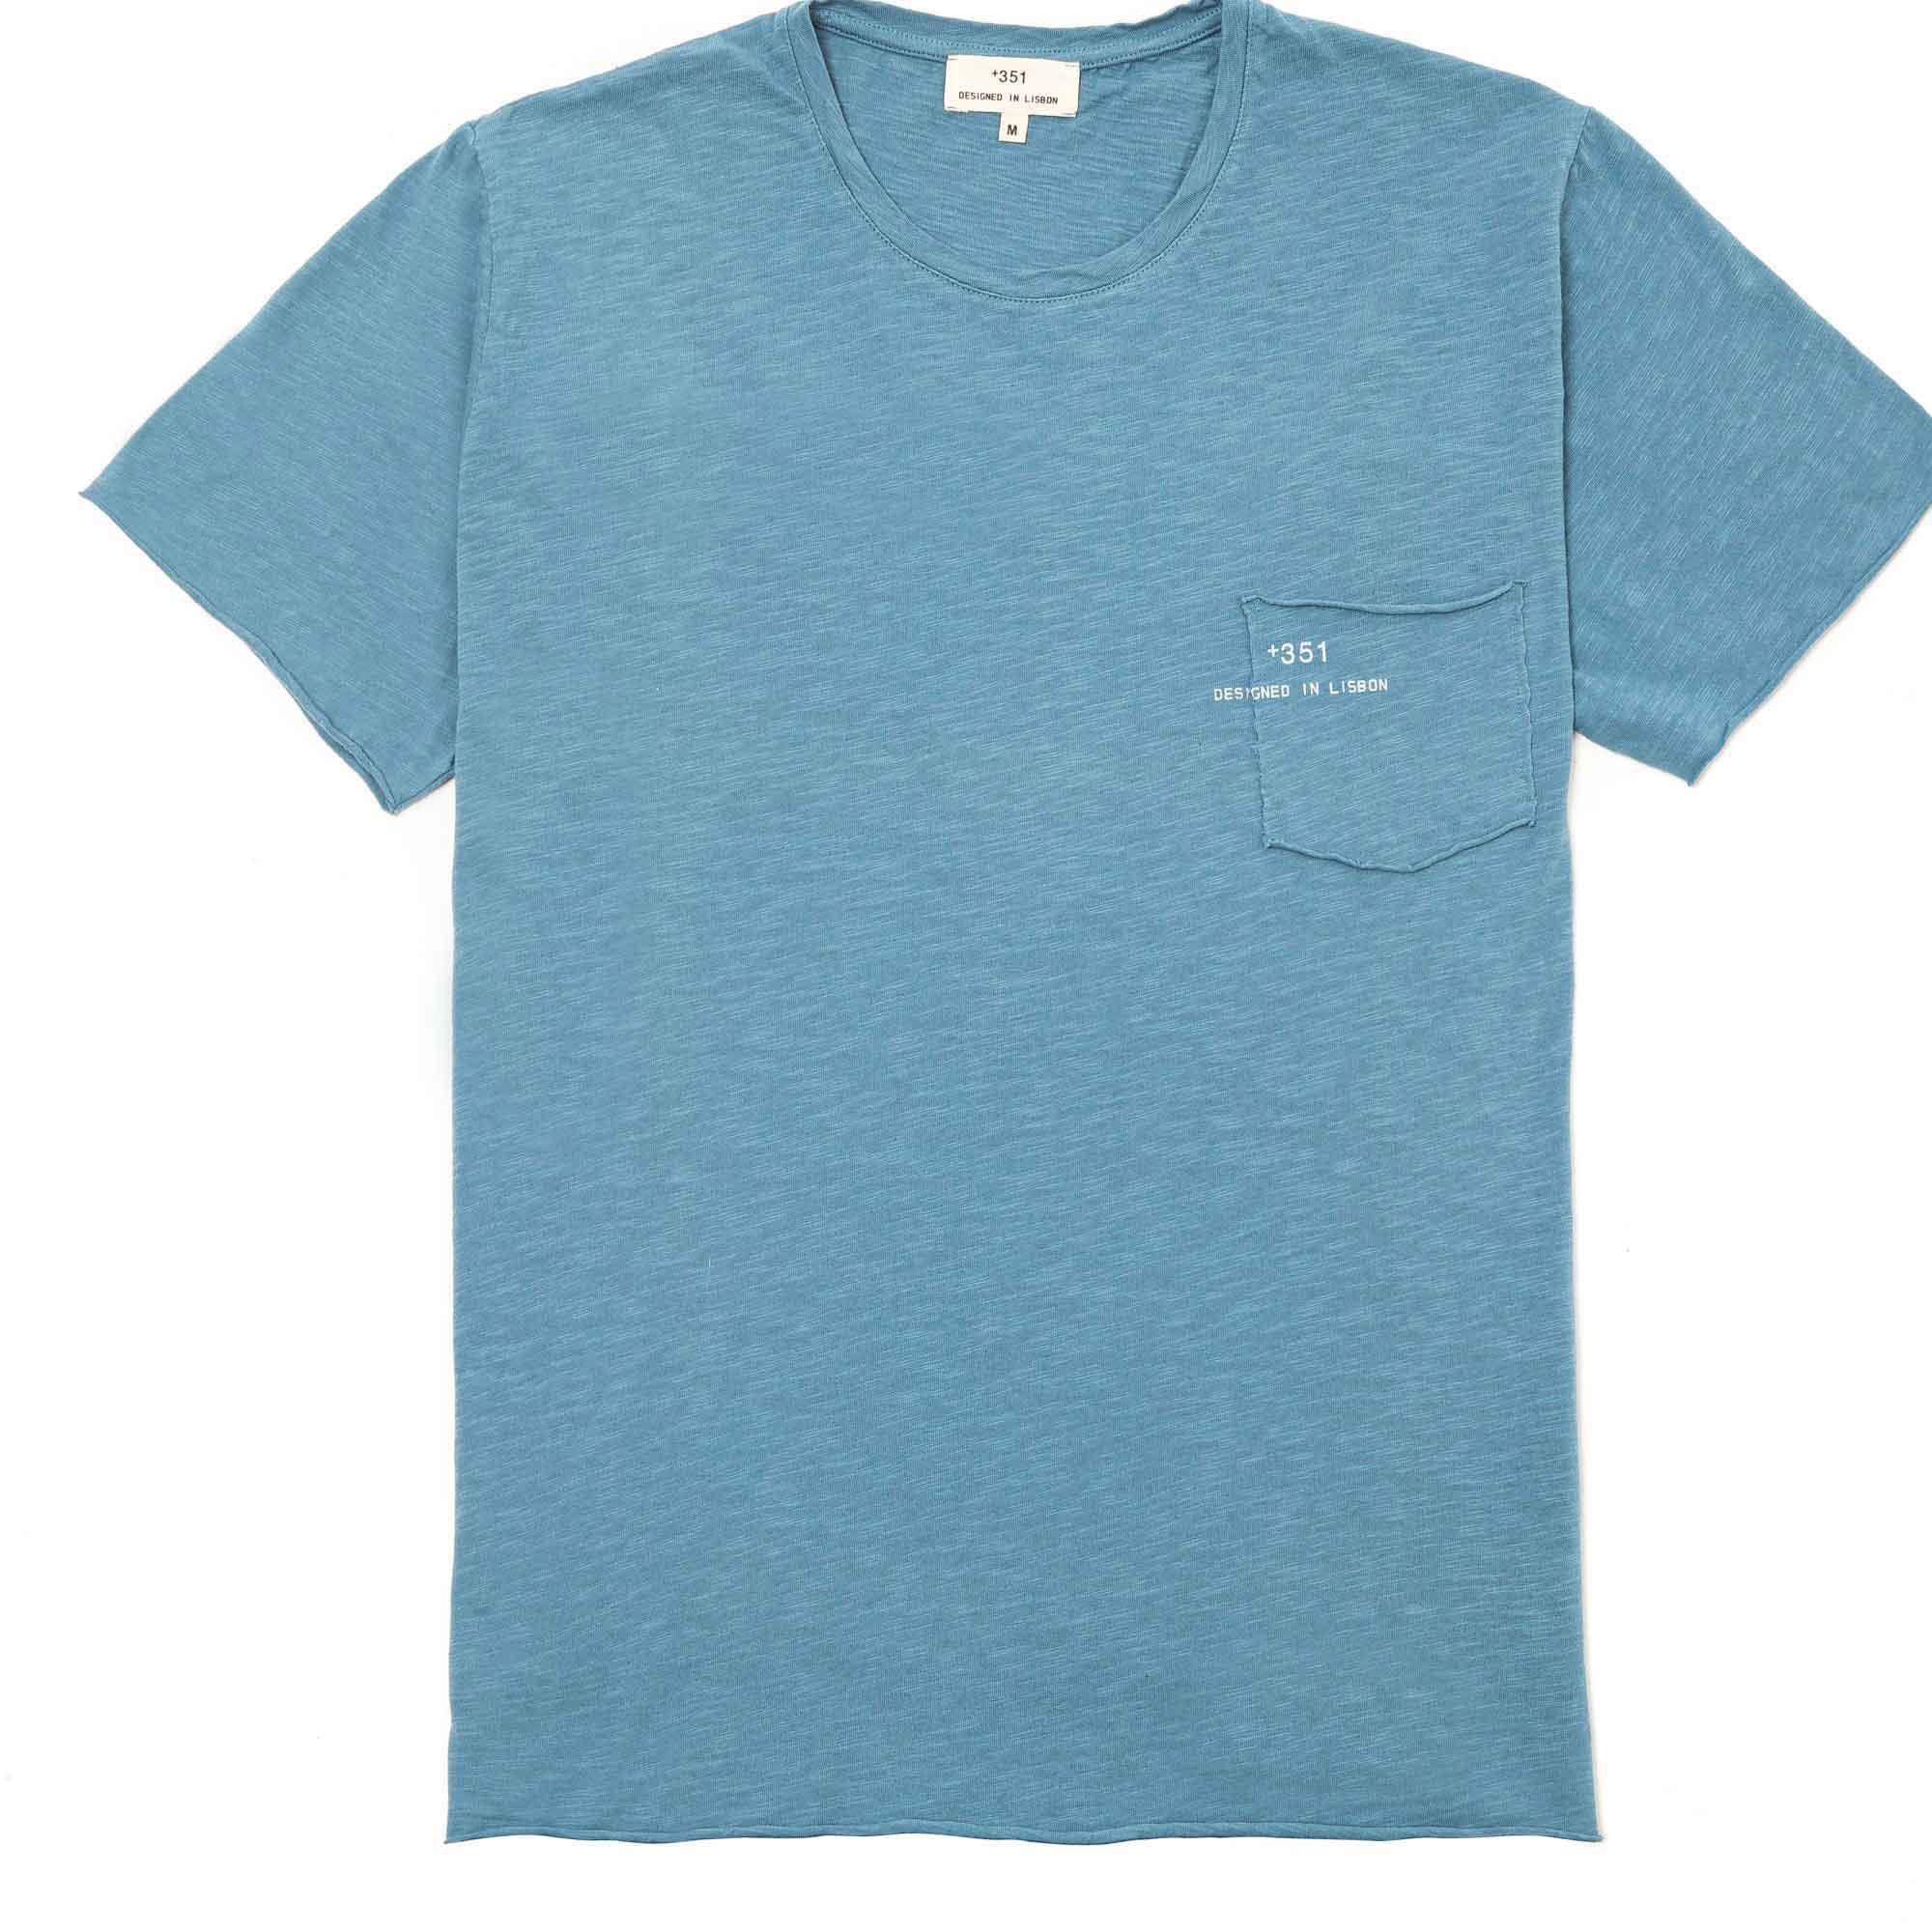 T-shirt manga corta azul denim con bolsa y logo impreso en la bolsa